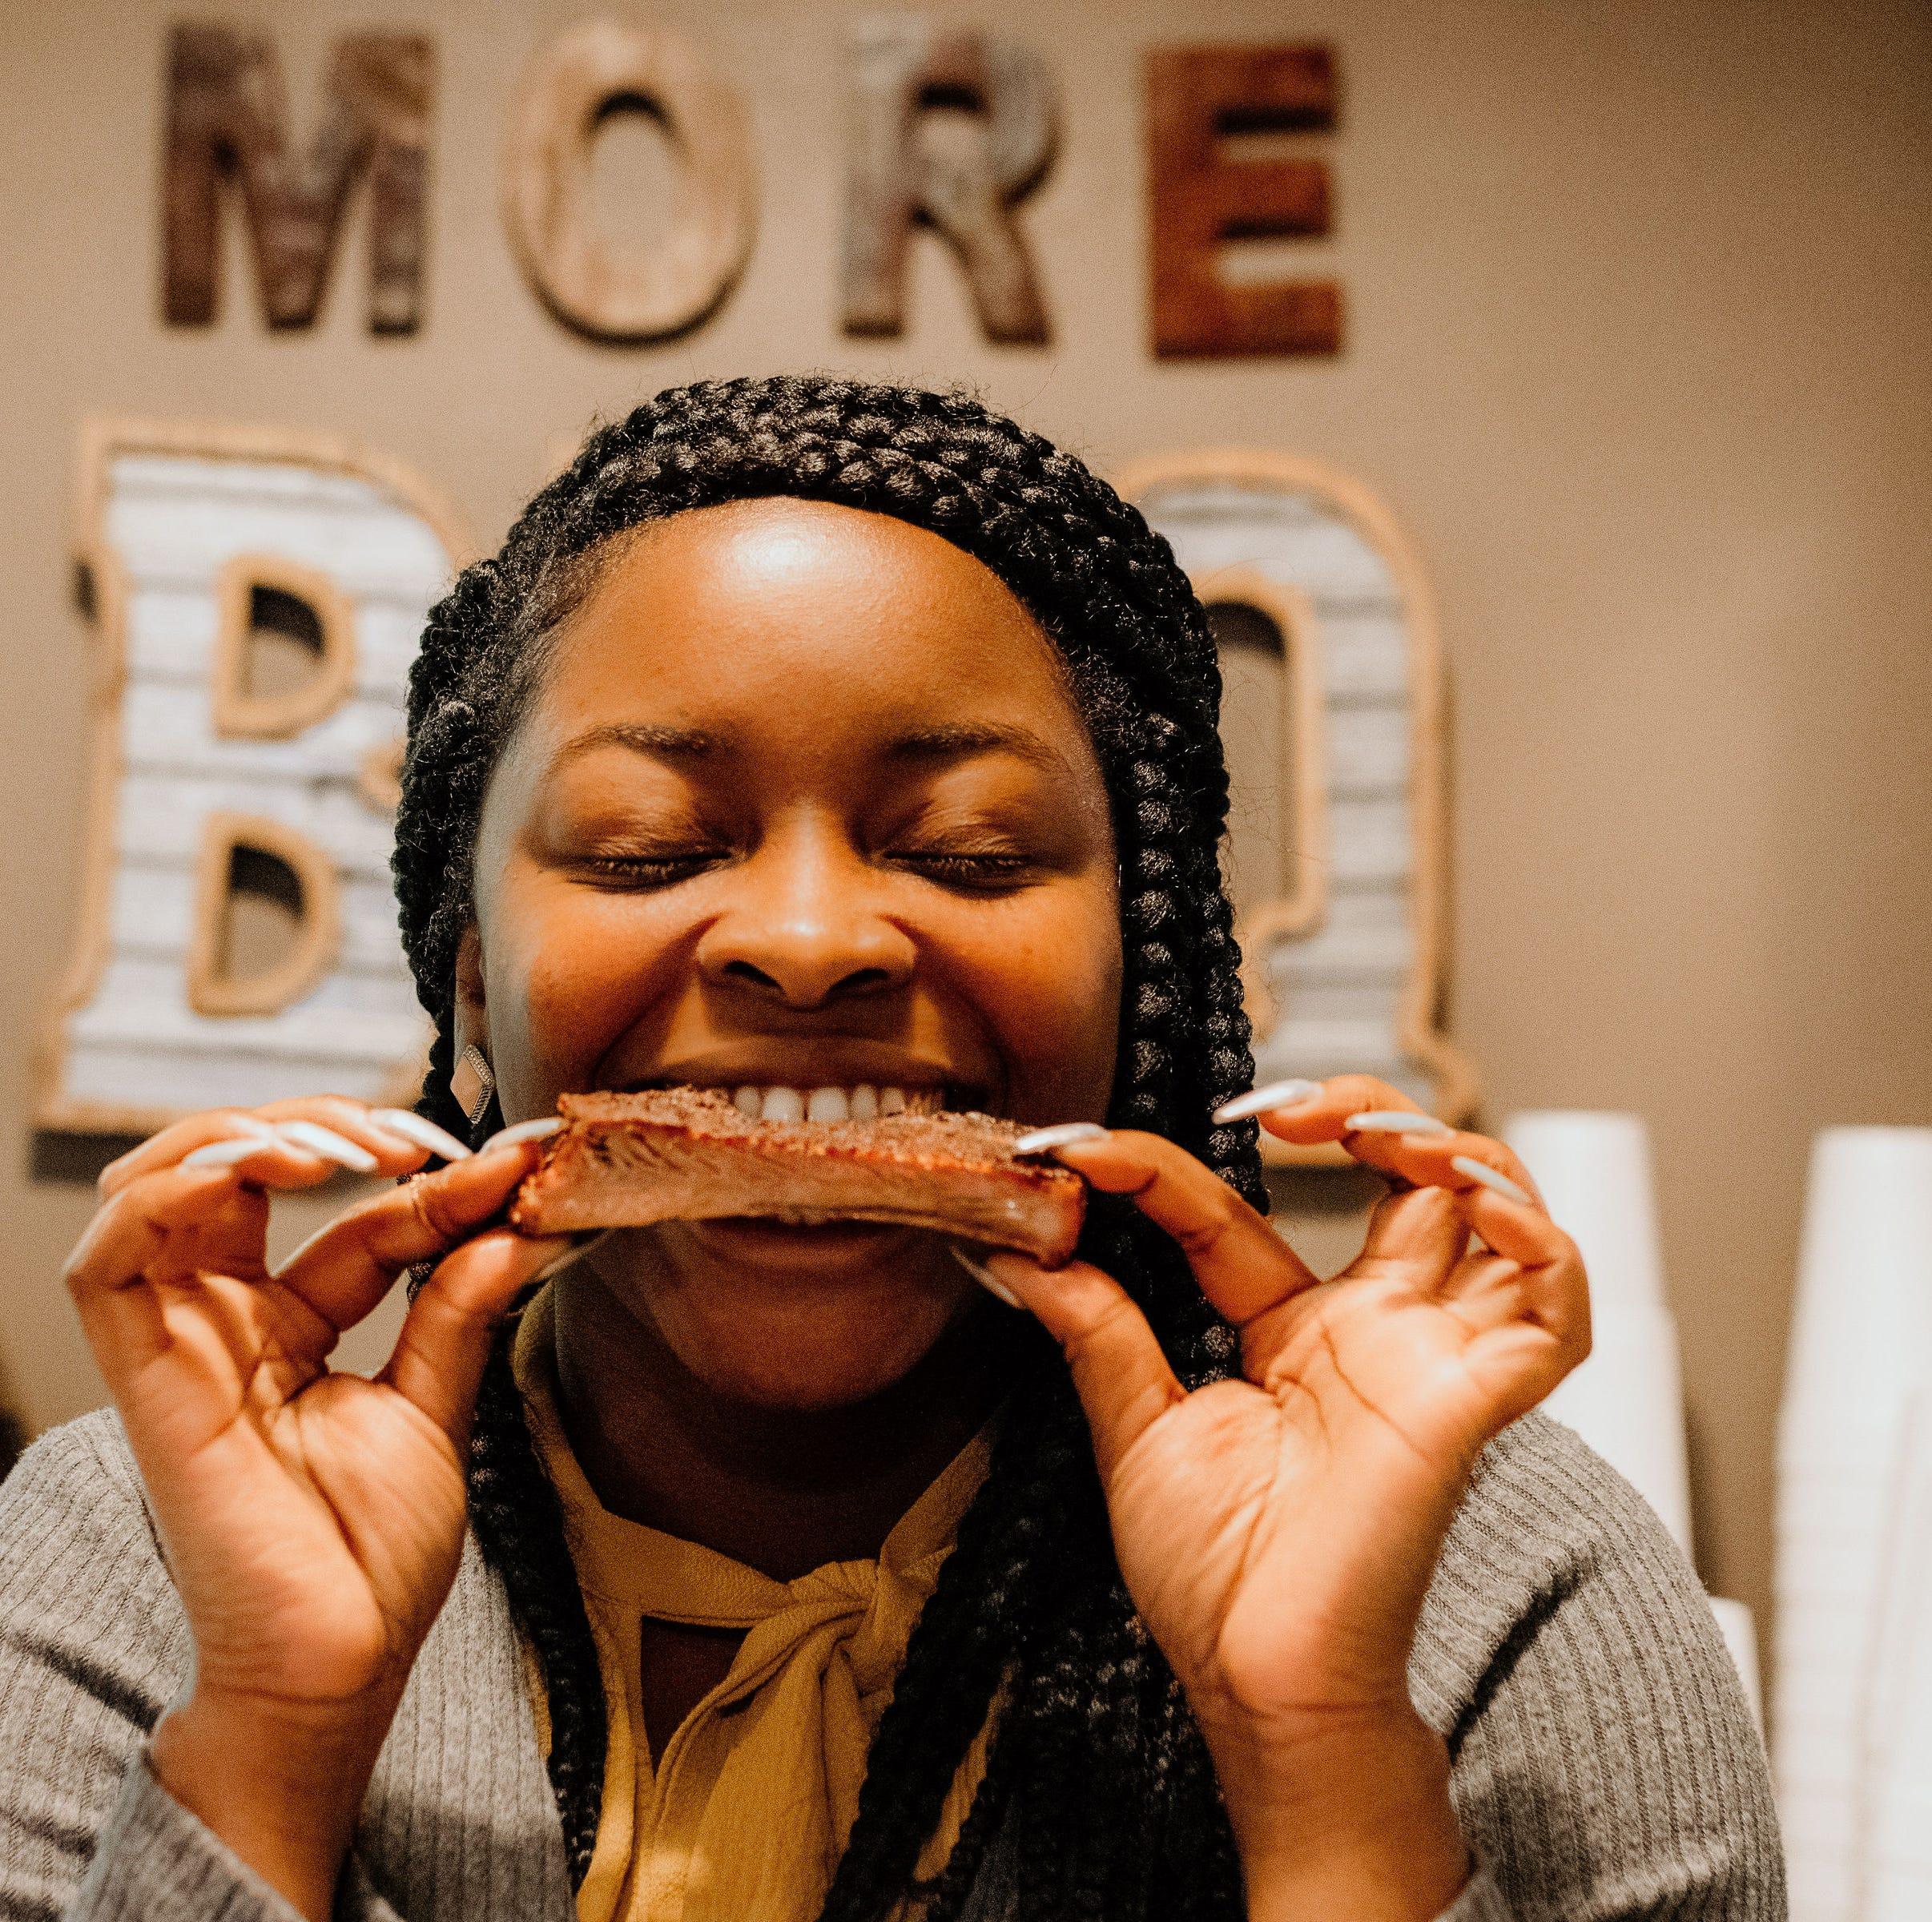 5 back road barbecue bites to savor in north Louisiana